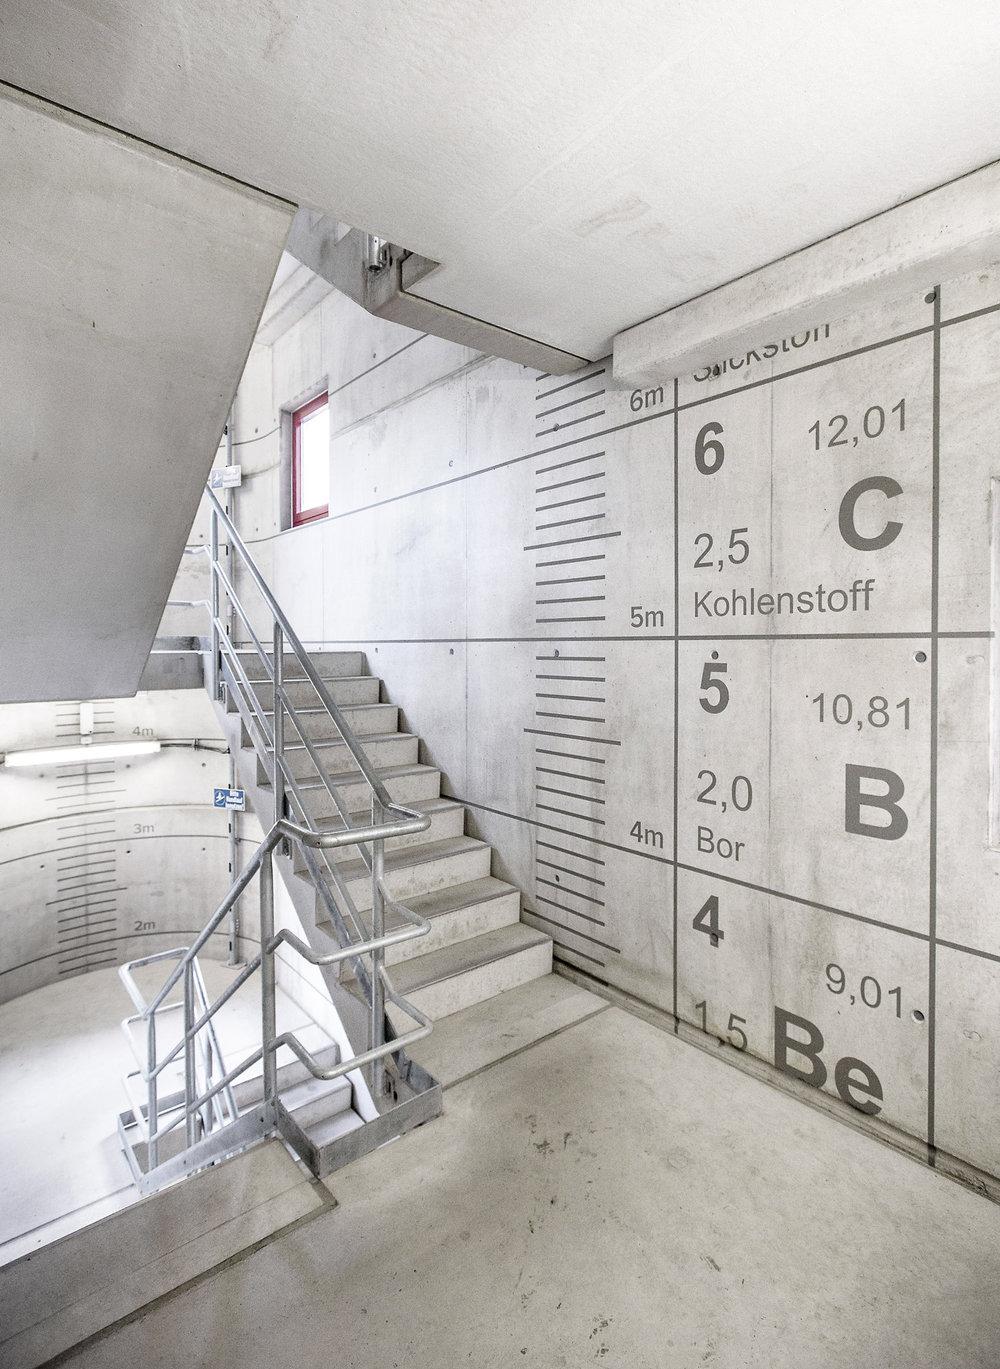 Bayer_Treppenhaus_Periodensystem_Chemie_Fassadenbeschriftung_Wegeleitsystem_Orientierungshilfe